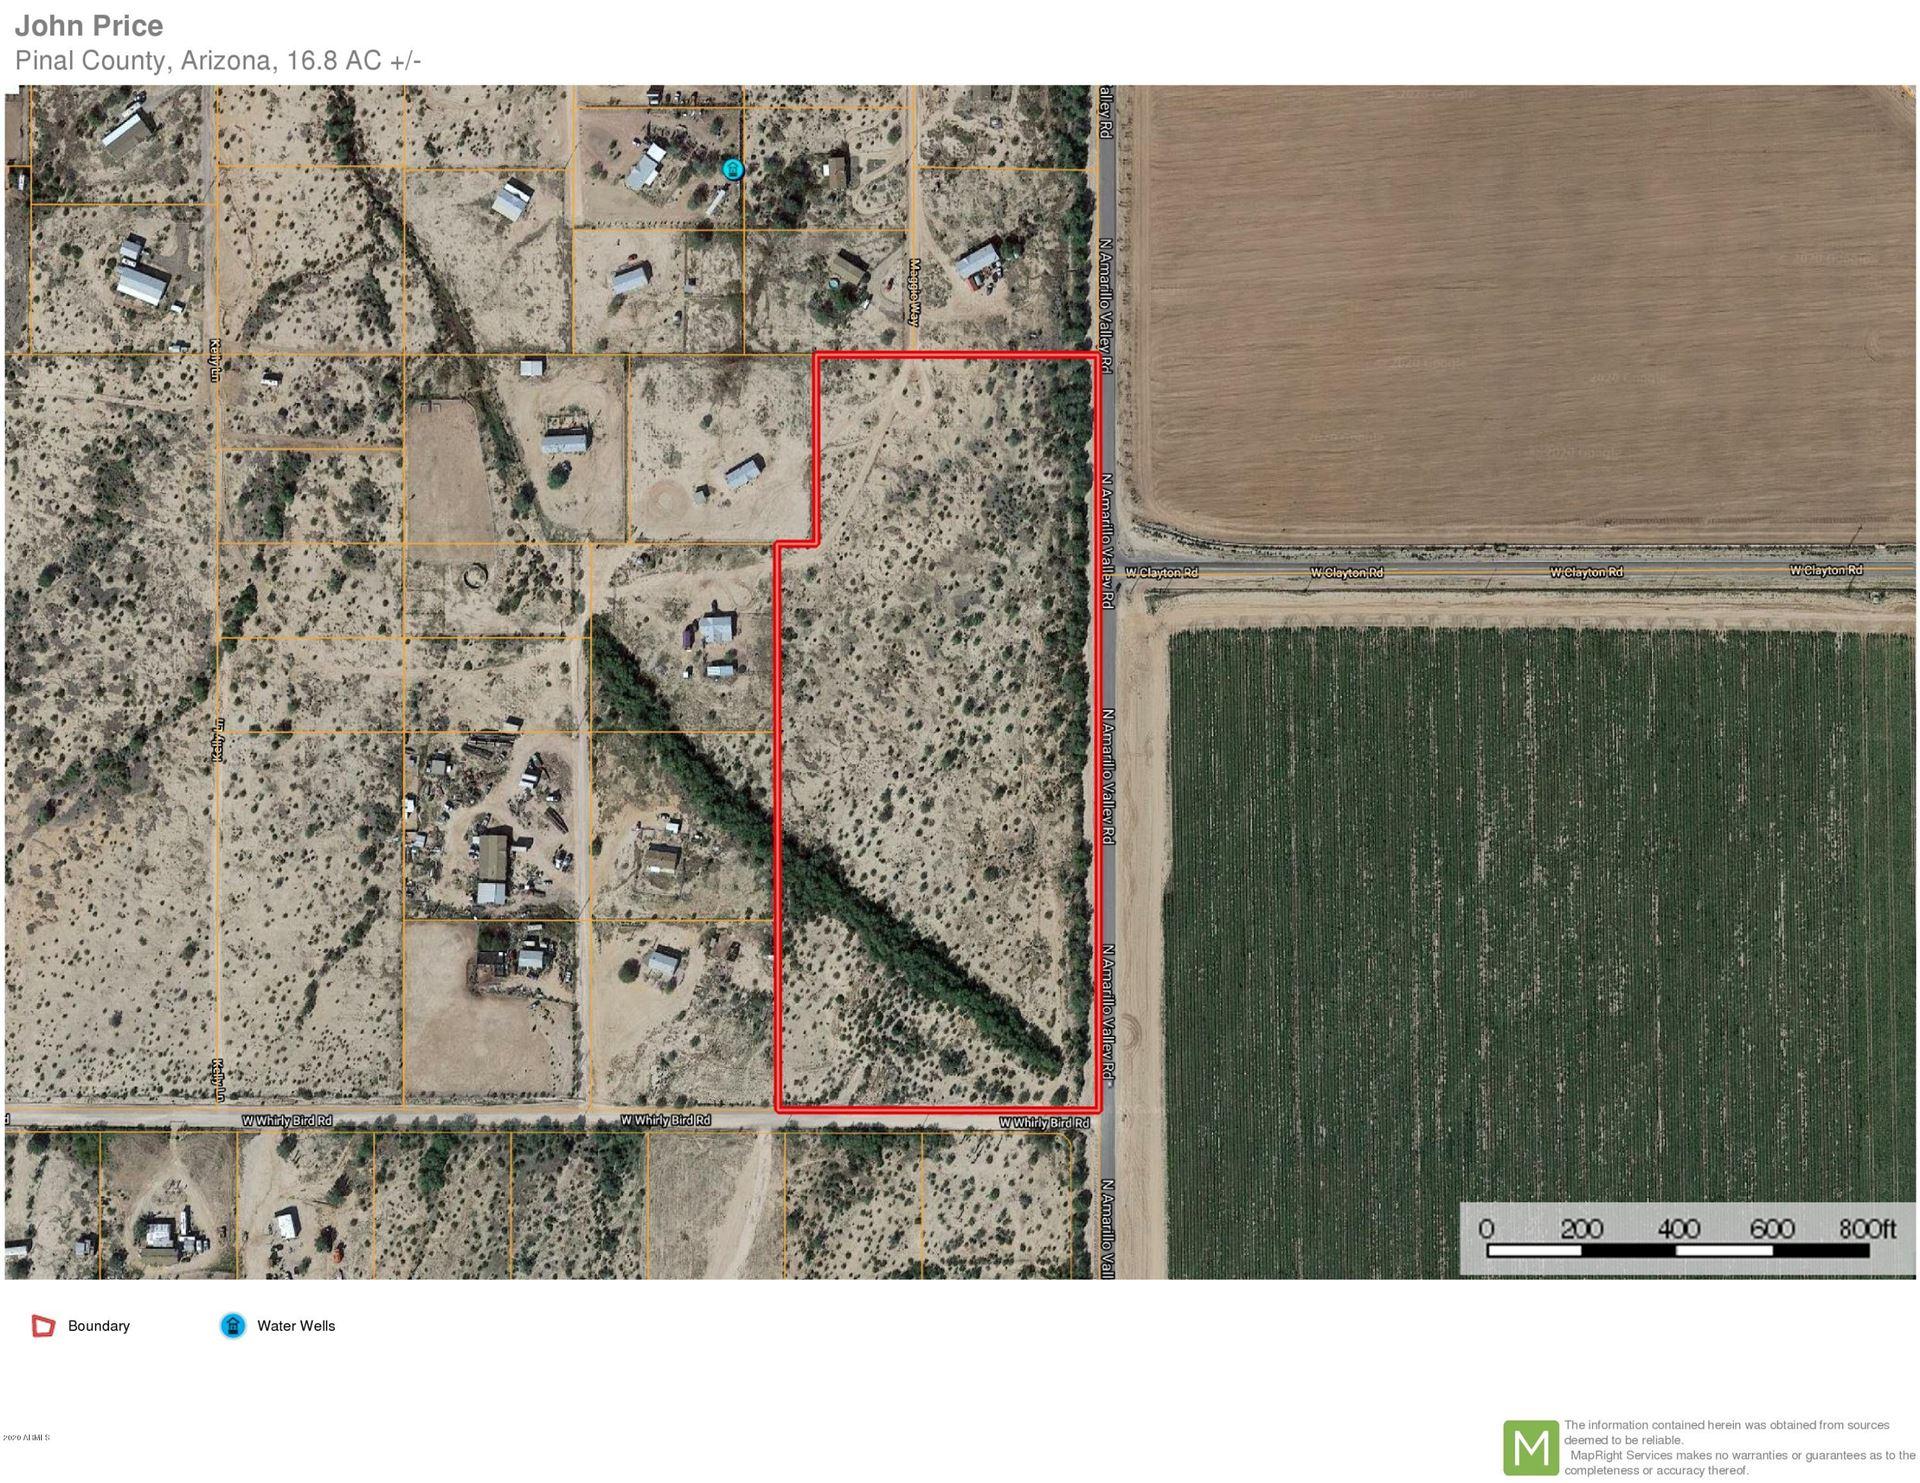 Photo for 1225 N Amarillo Valley Road, Maricopa, AZ 85139 (MLS # 6118411)